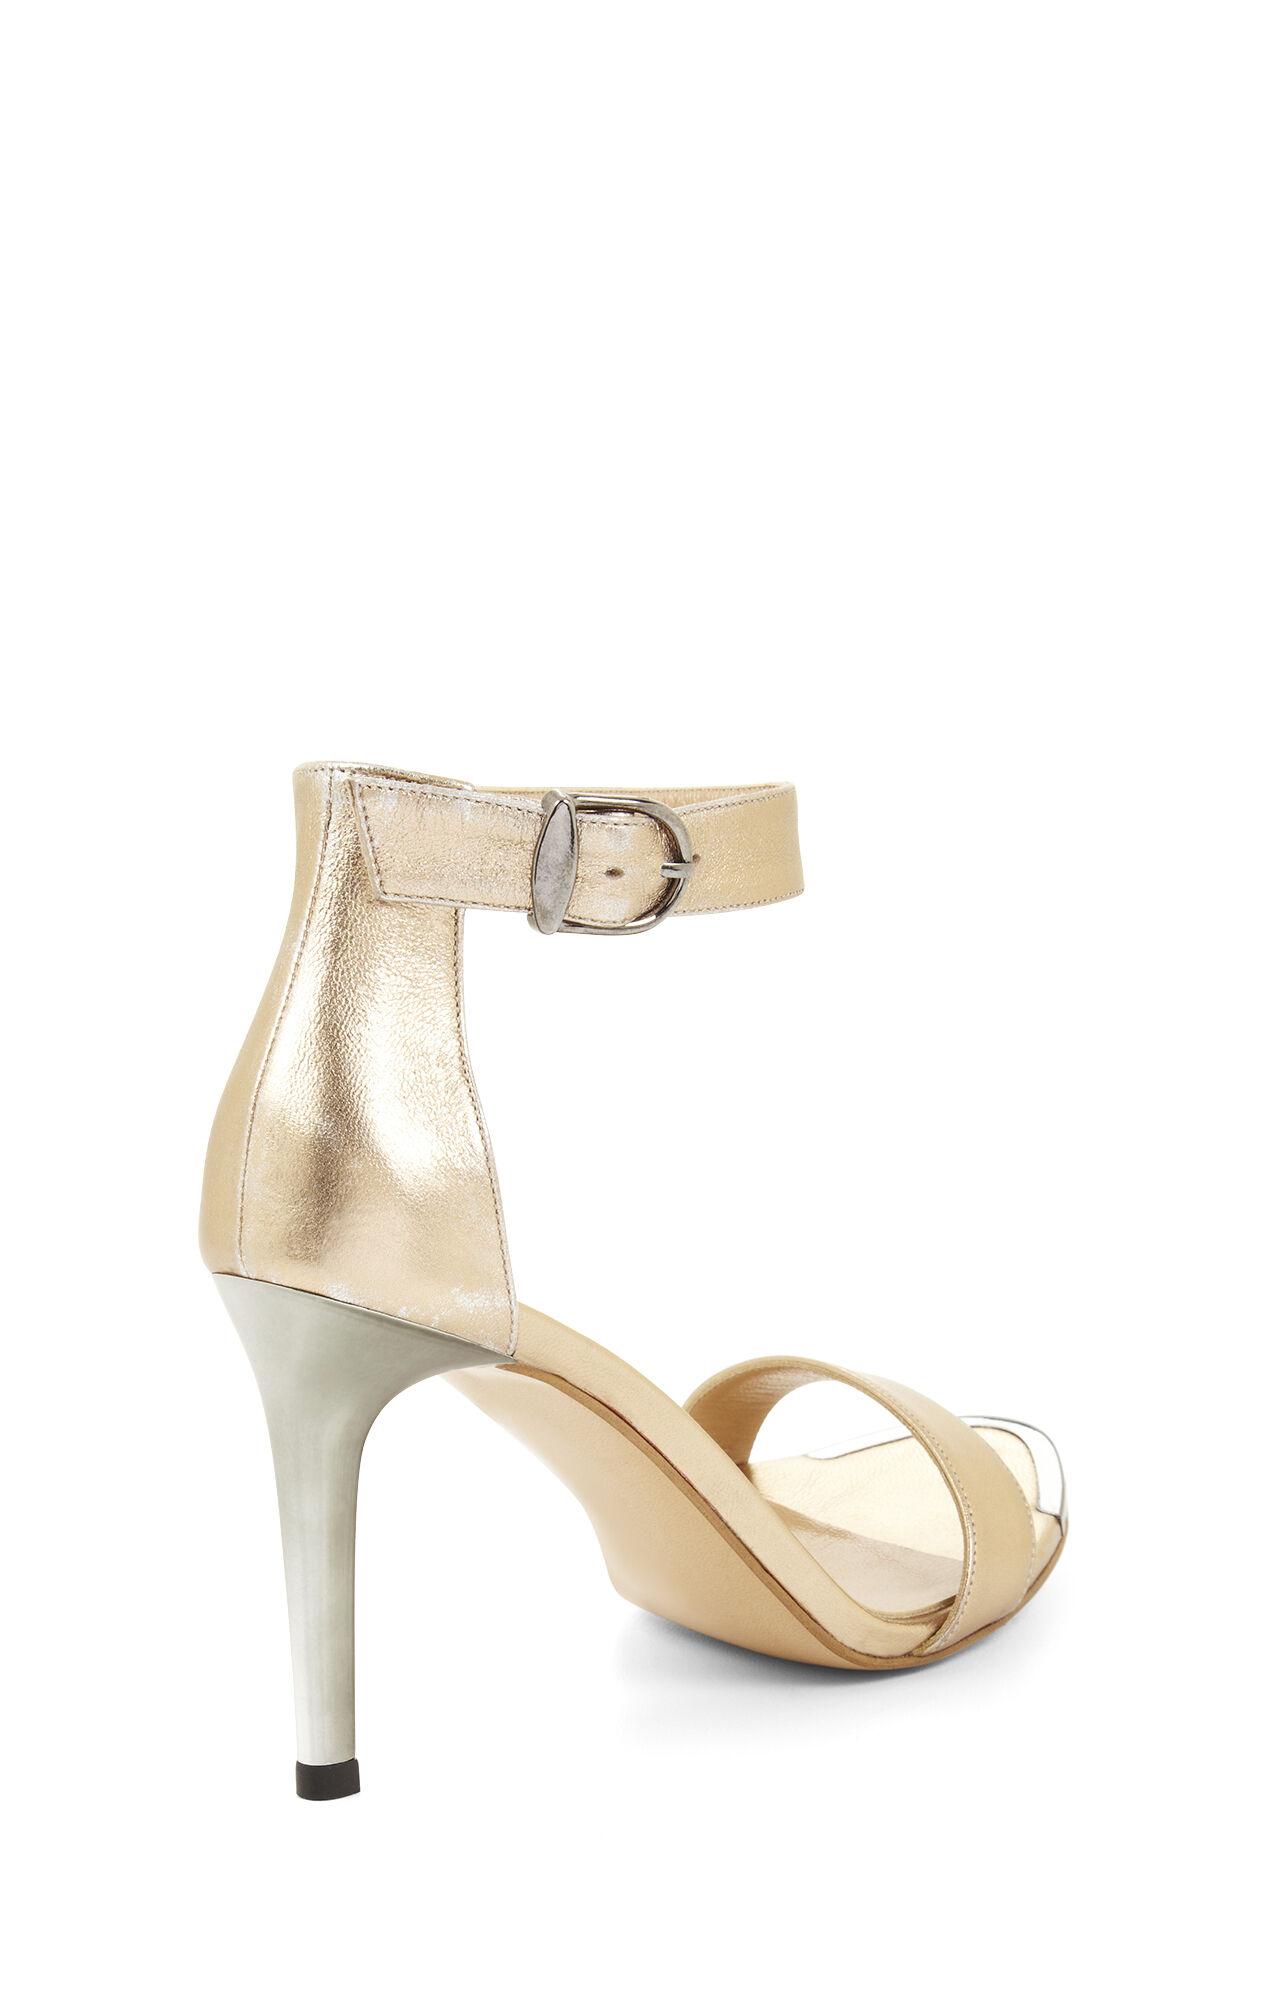 High-Heel Open-Toe Sandal